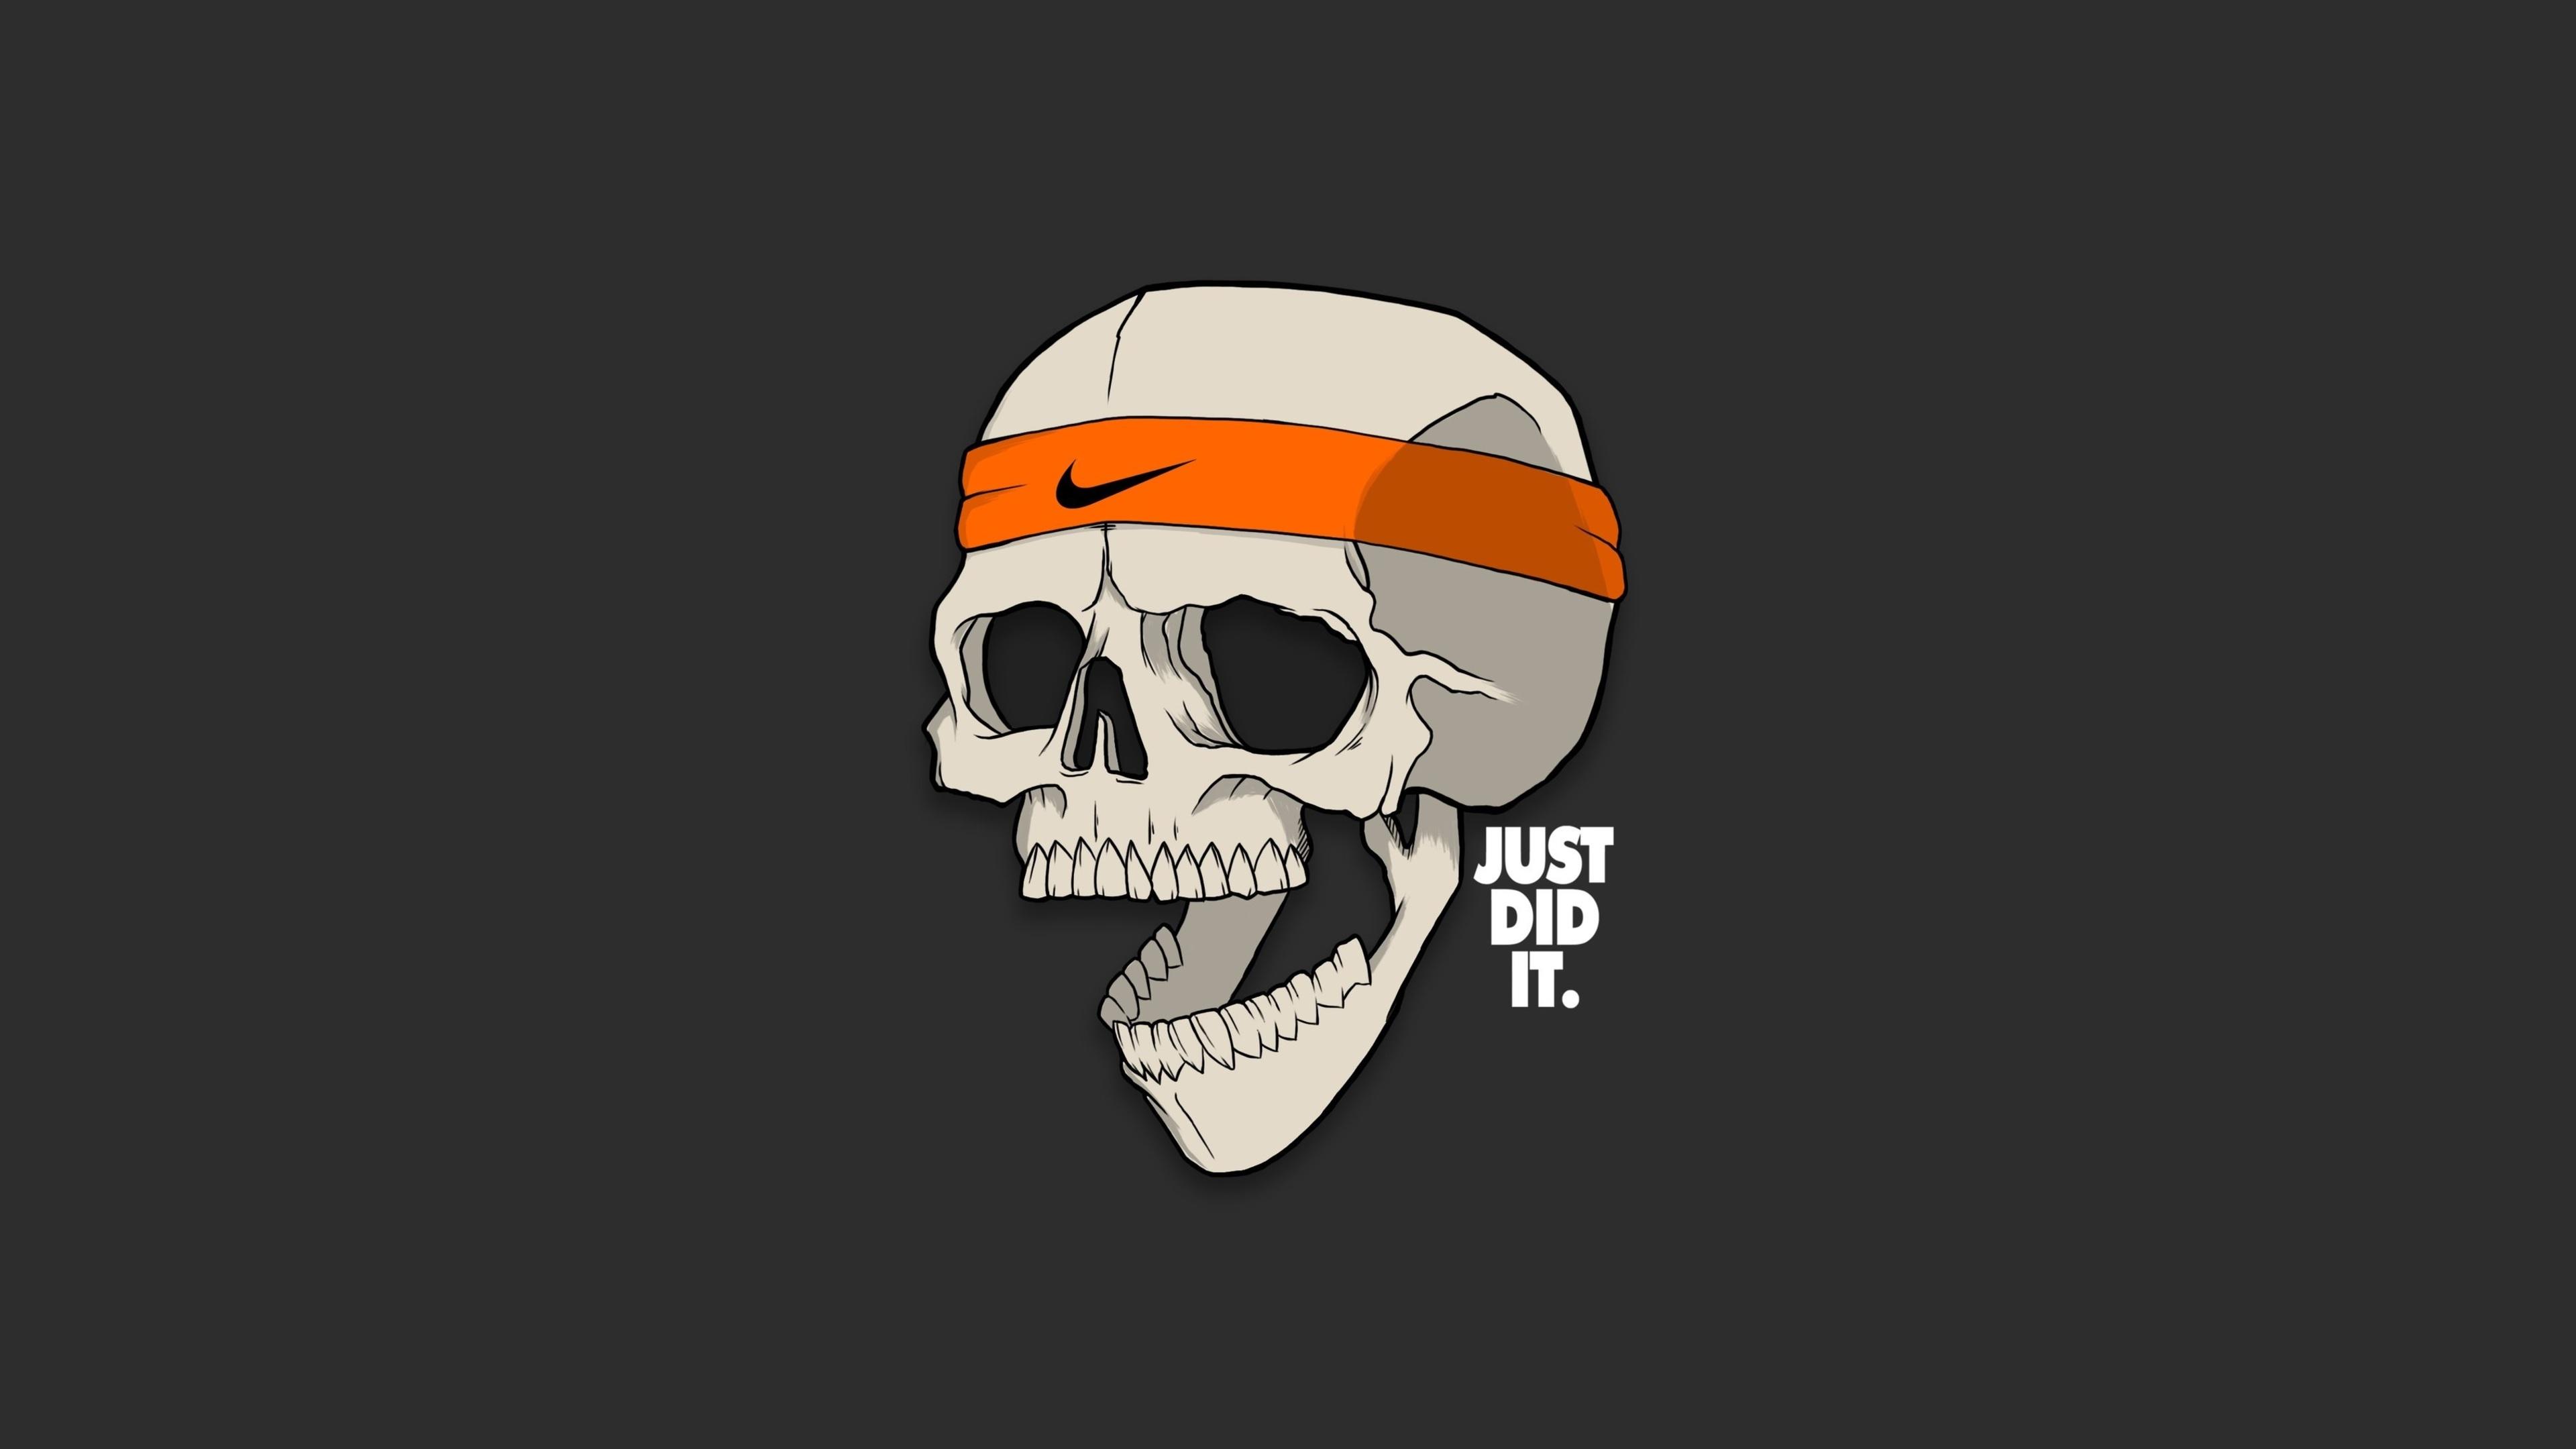 Skull And Bones 2018 Video Game 4k Hd Desktop Wallpaper: Skull Just Did It Minimalism 4k Skull Wallpapers